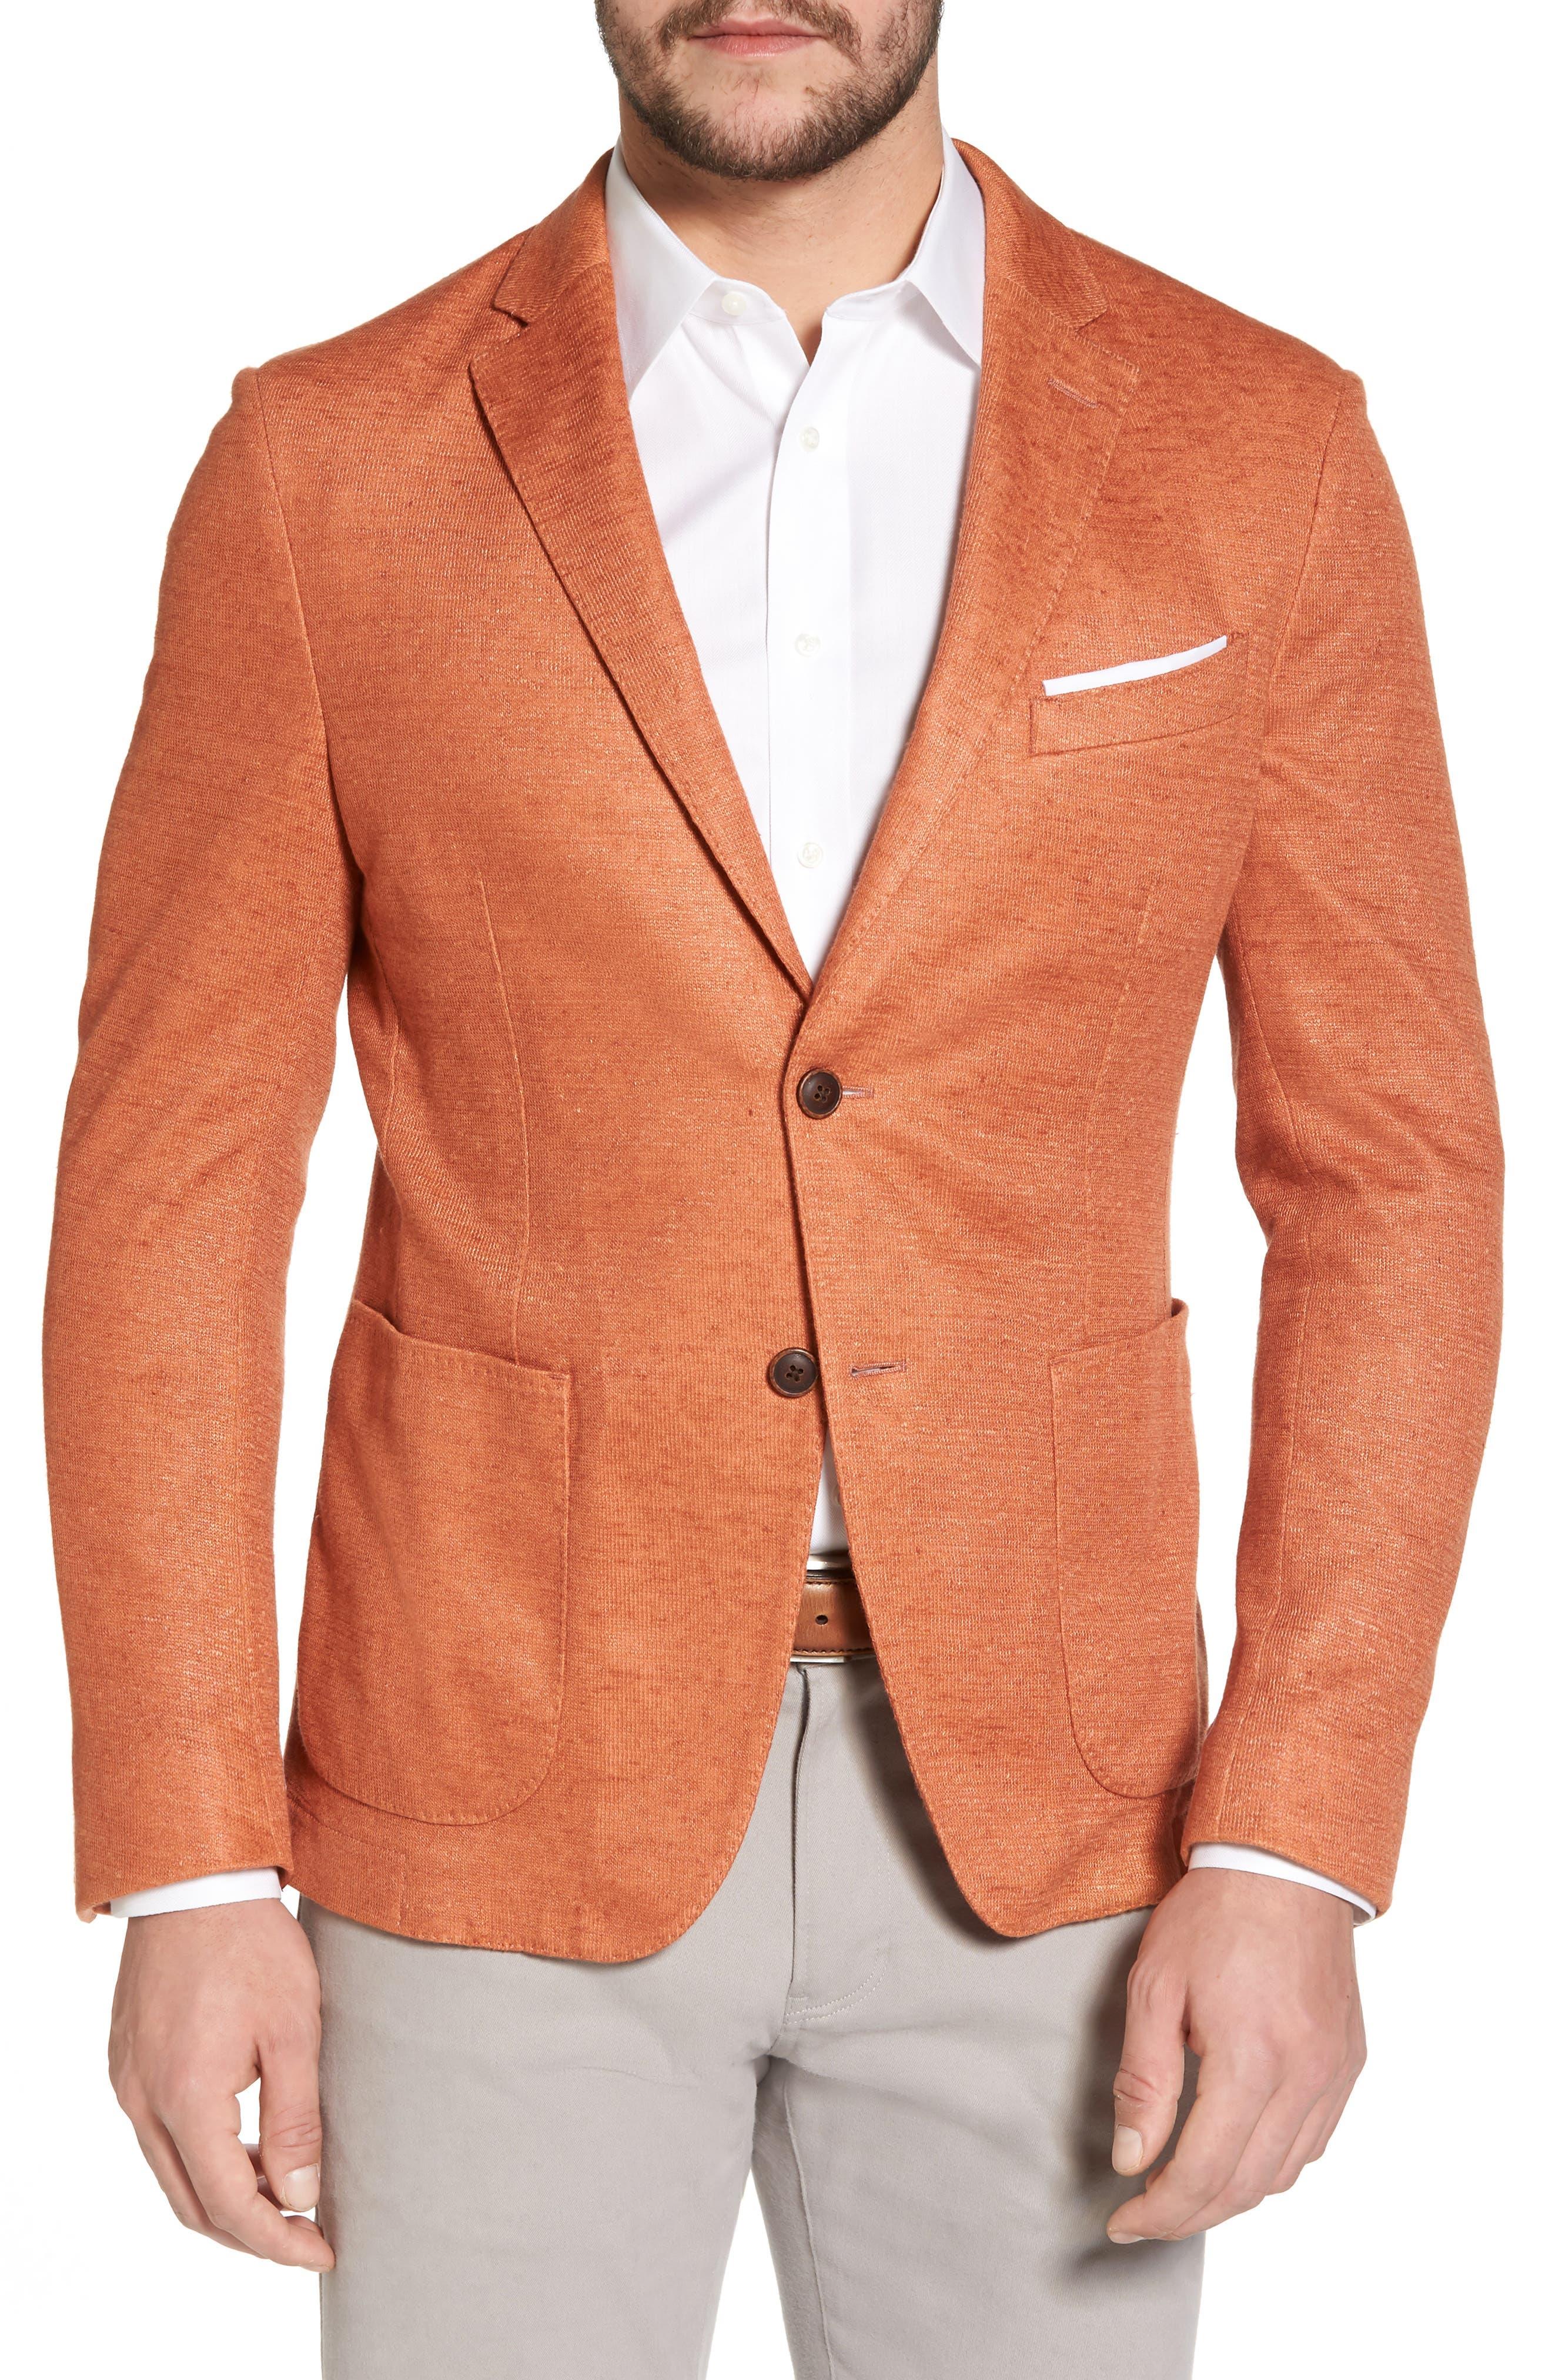 FLYNT Trim Fit Heathered Jersey Blazer